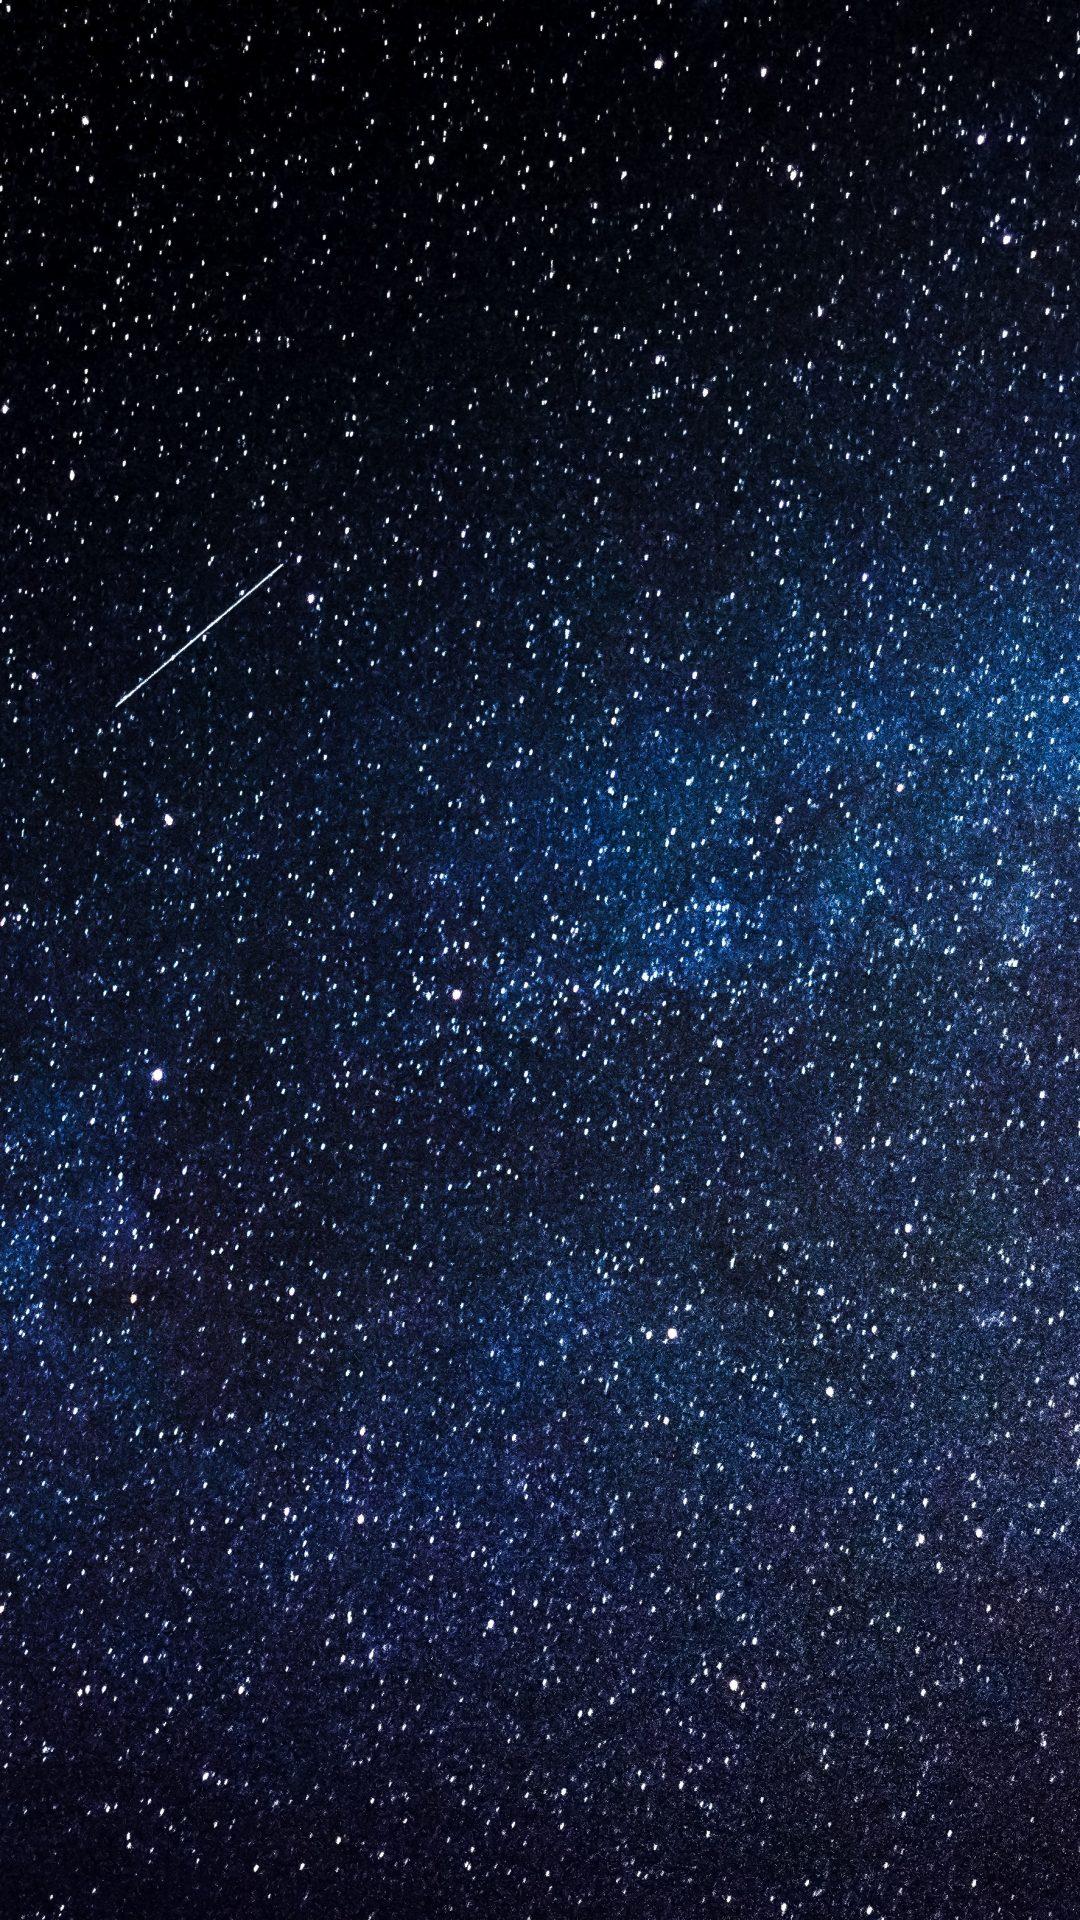 Blue starry sky 5k uhd wallpaper - Starry sky 4k ...